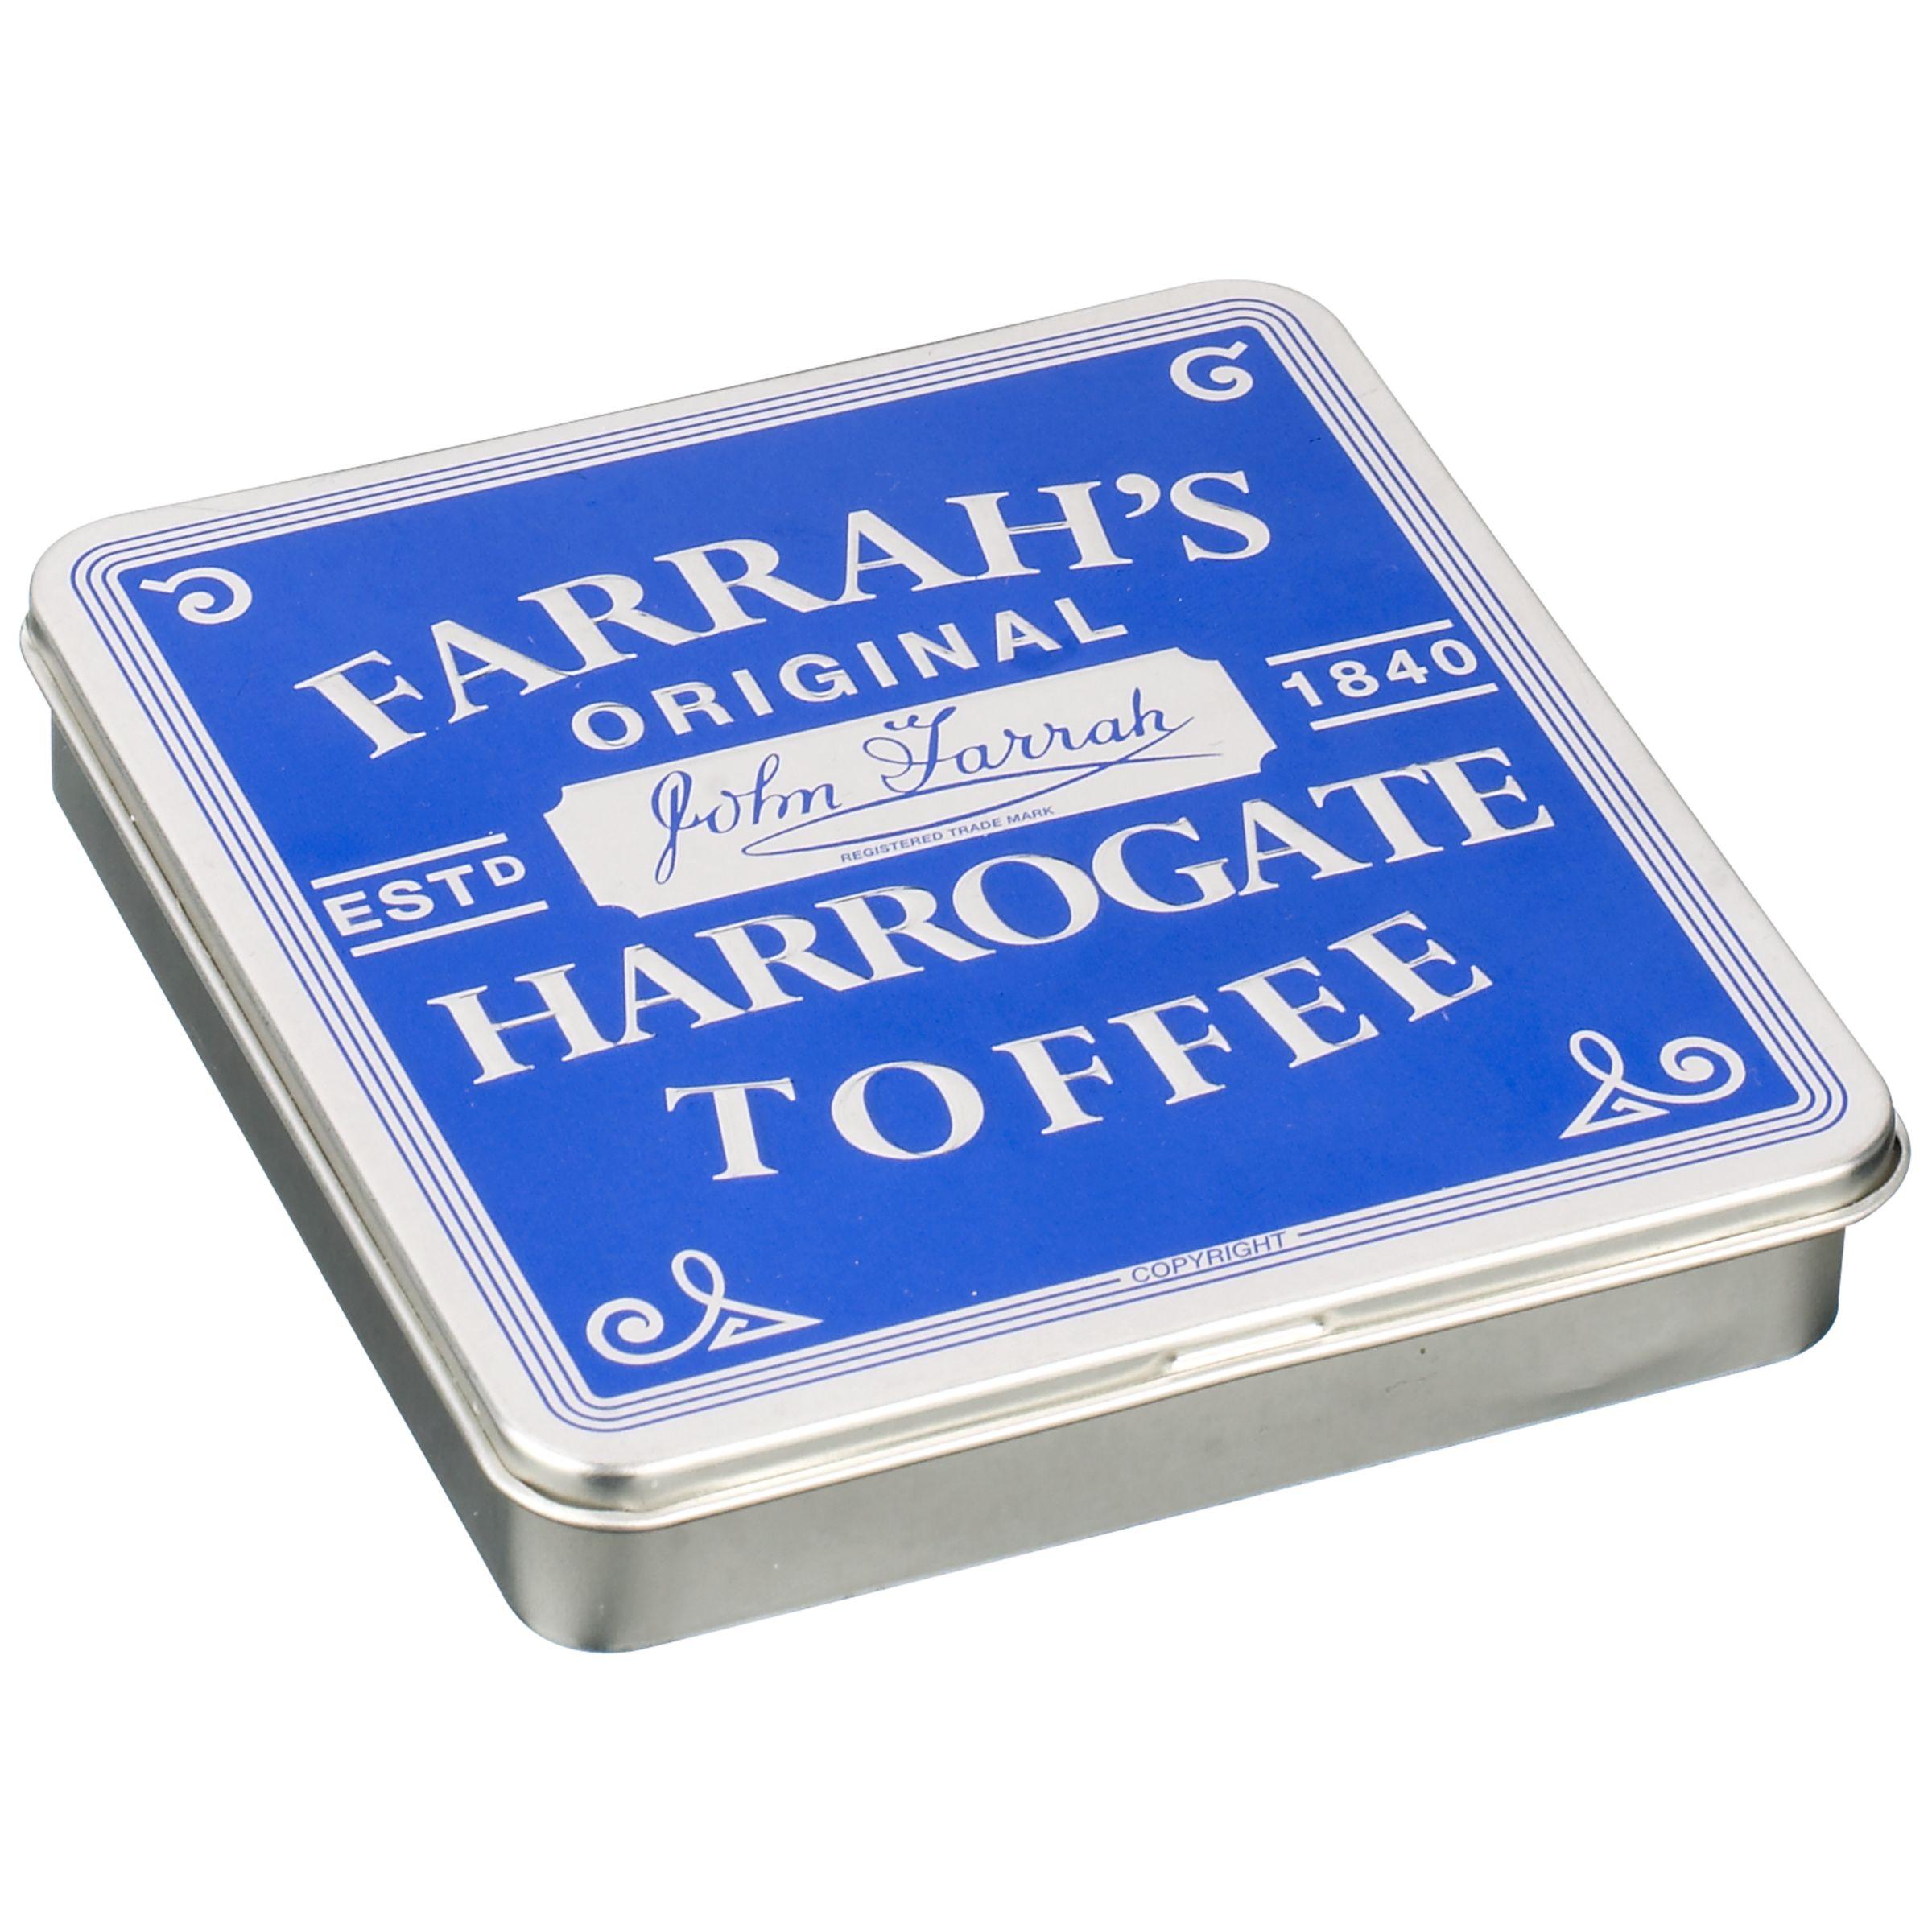 Farrah's Farrah's Harrogate Toffee, 100g tin